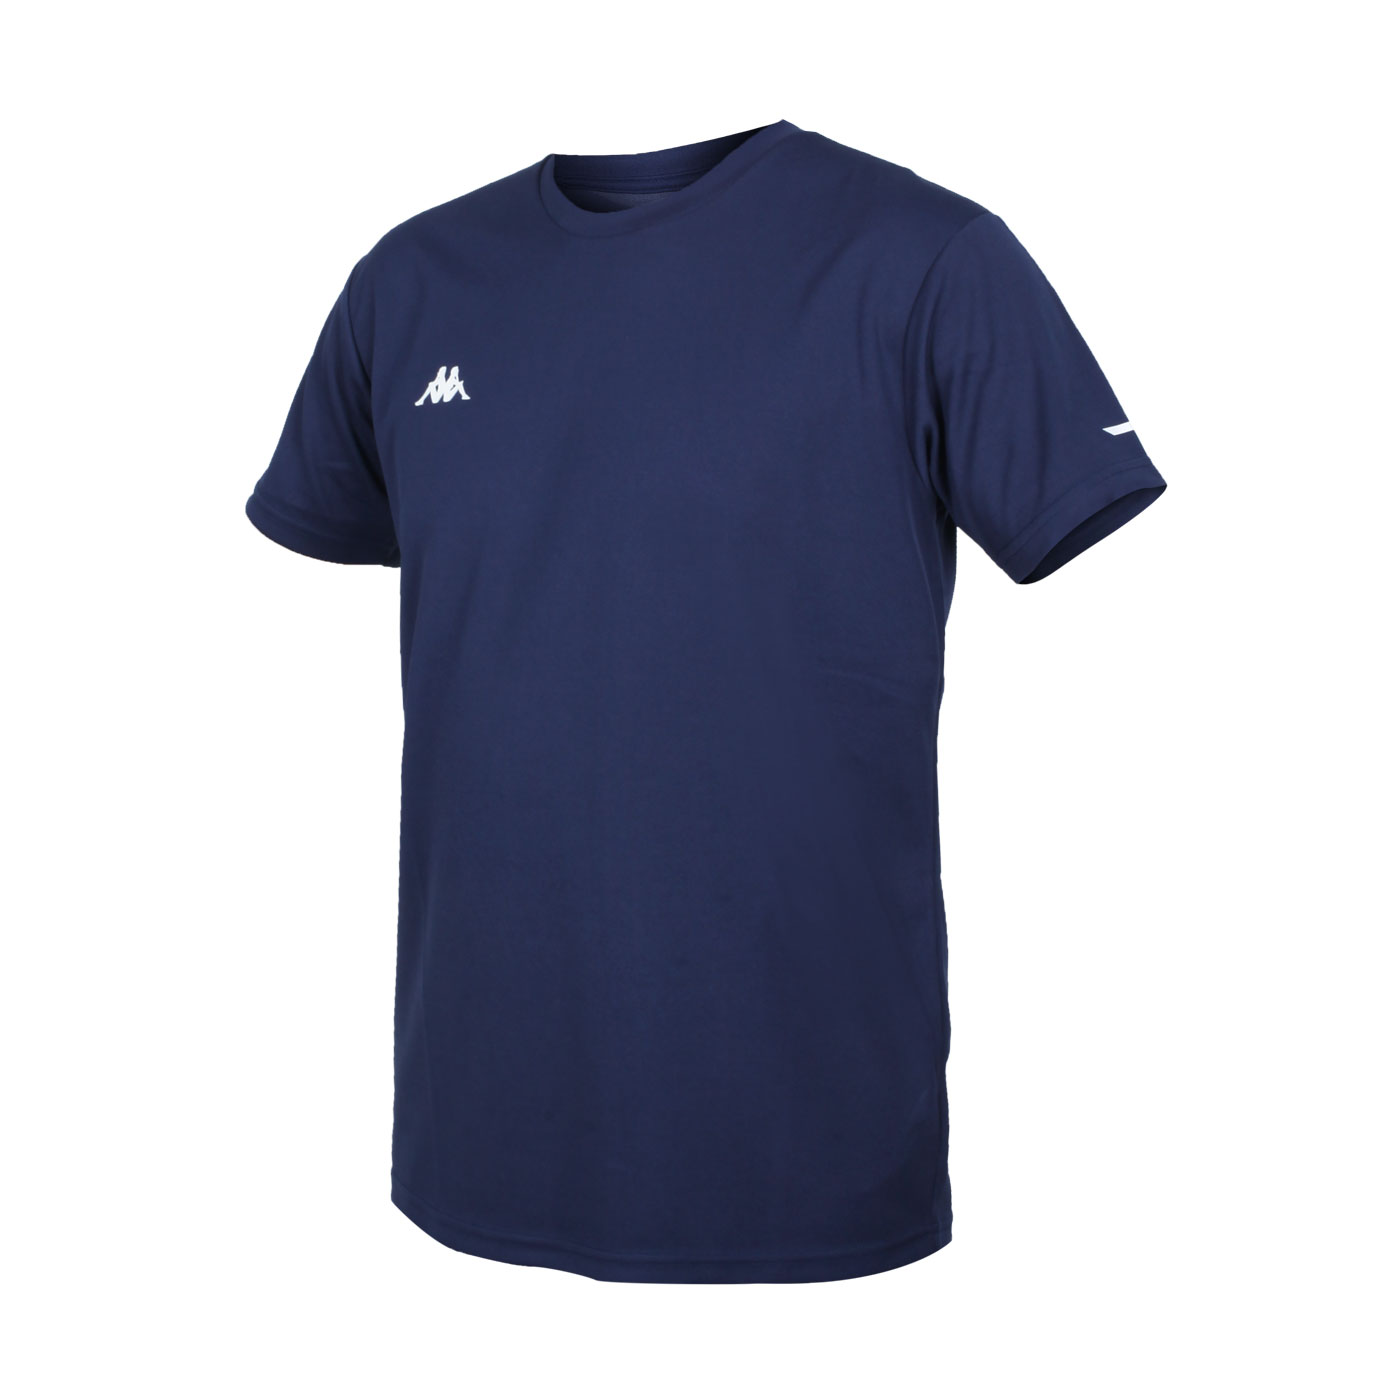 KAPPA 男款K4T短袖T恤 33162PW-B29 - 丈青白